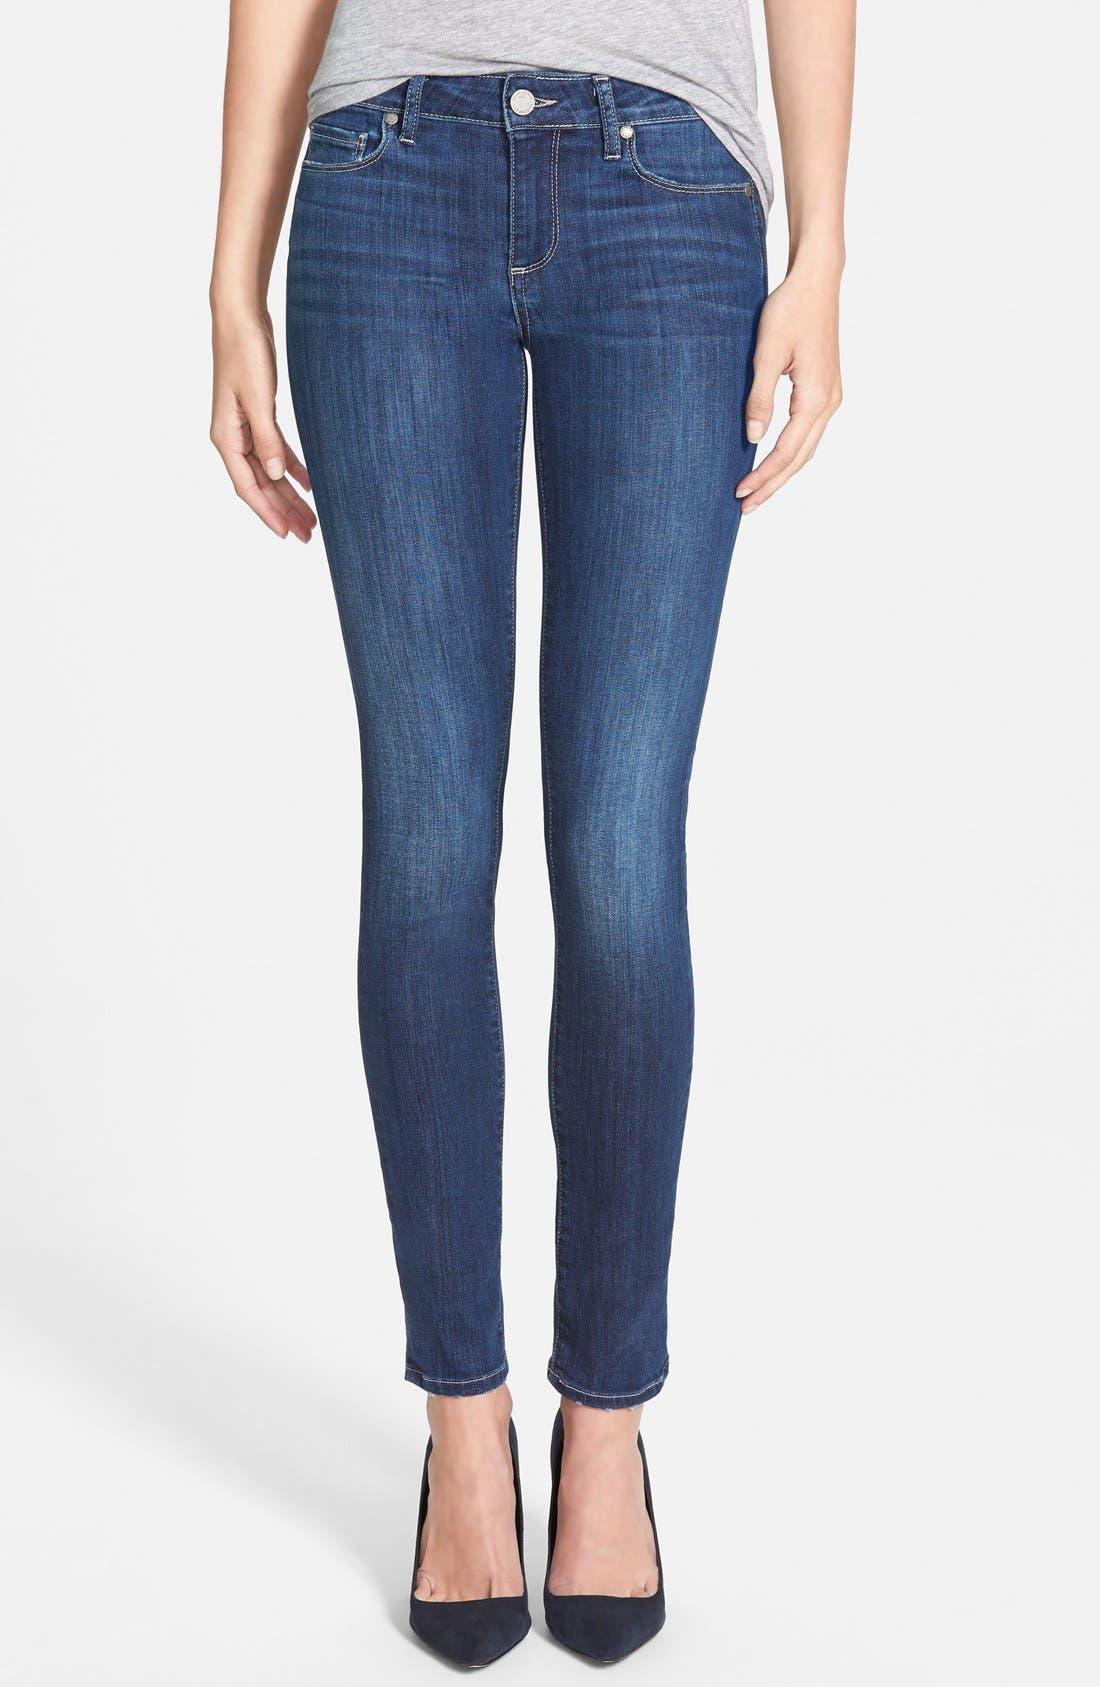 Alternate Image 1 Selected - Paige Denim 'Skyline' Skinny Jeans (Raya) (Nordstrom Exclusive)